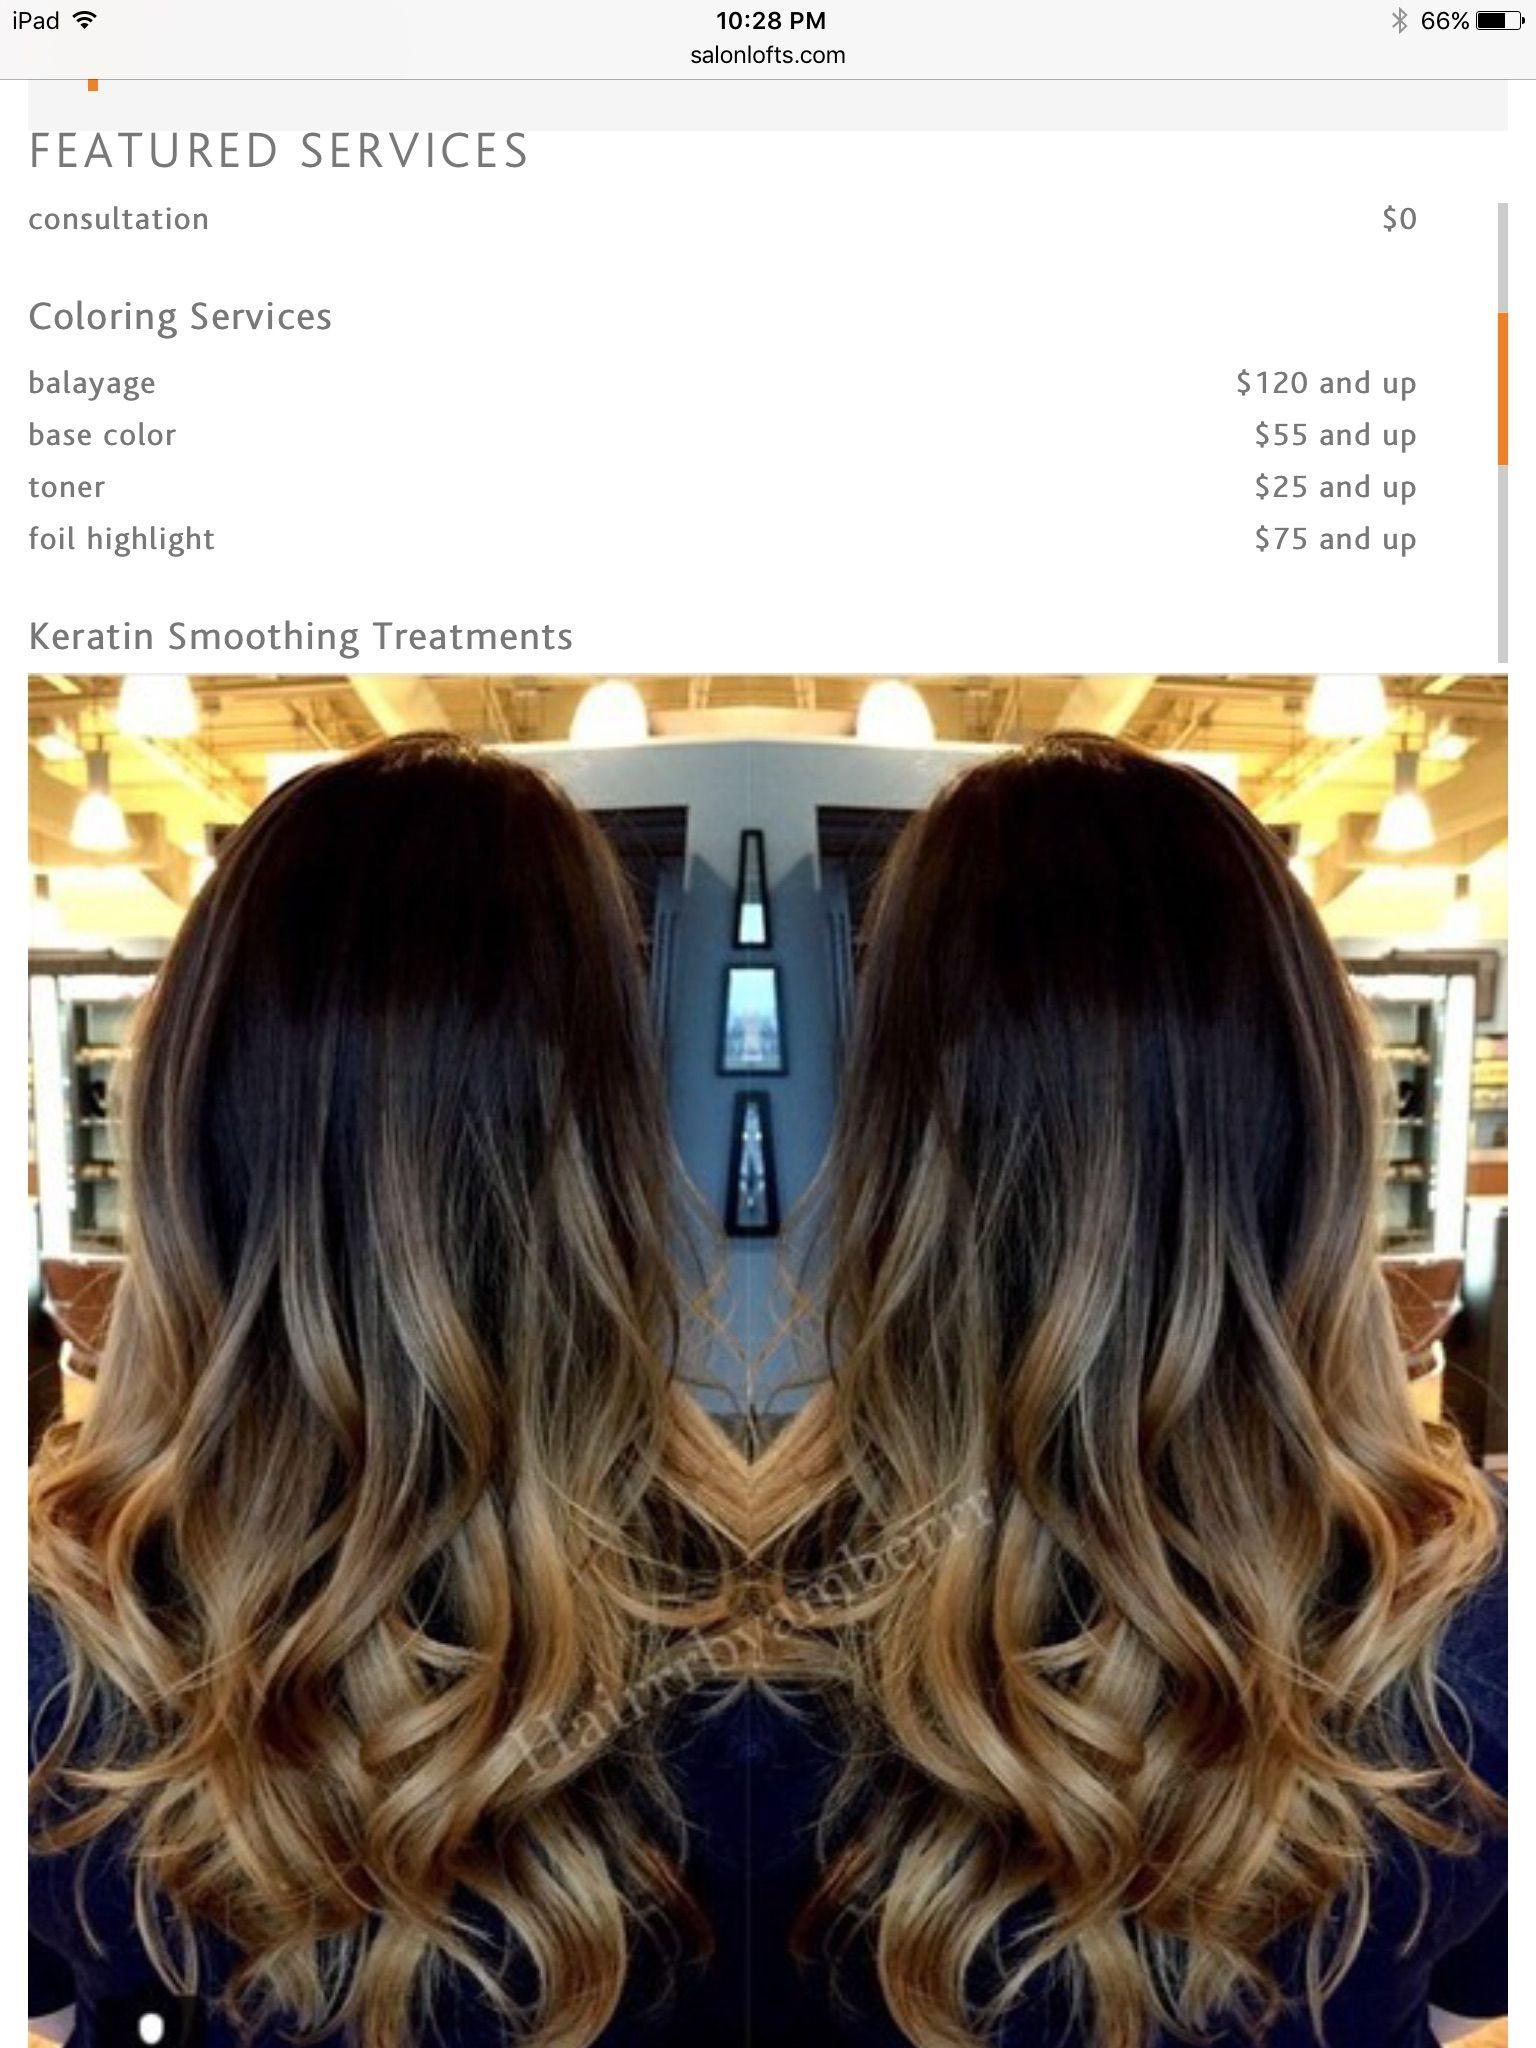 Pin by Mani on Beauty - Hairstyles   Keratin smoothing treatment, Smoothing treatment, Hair styles